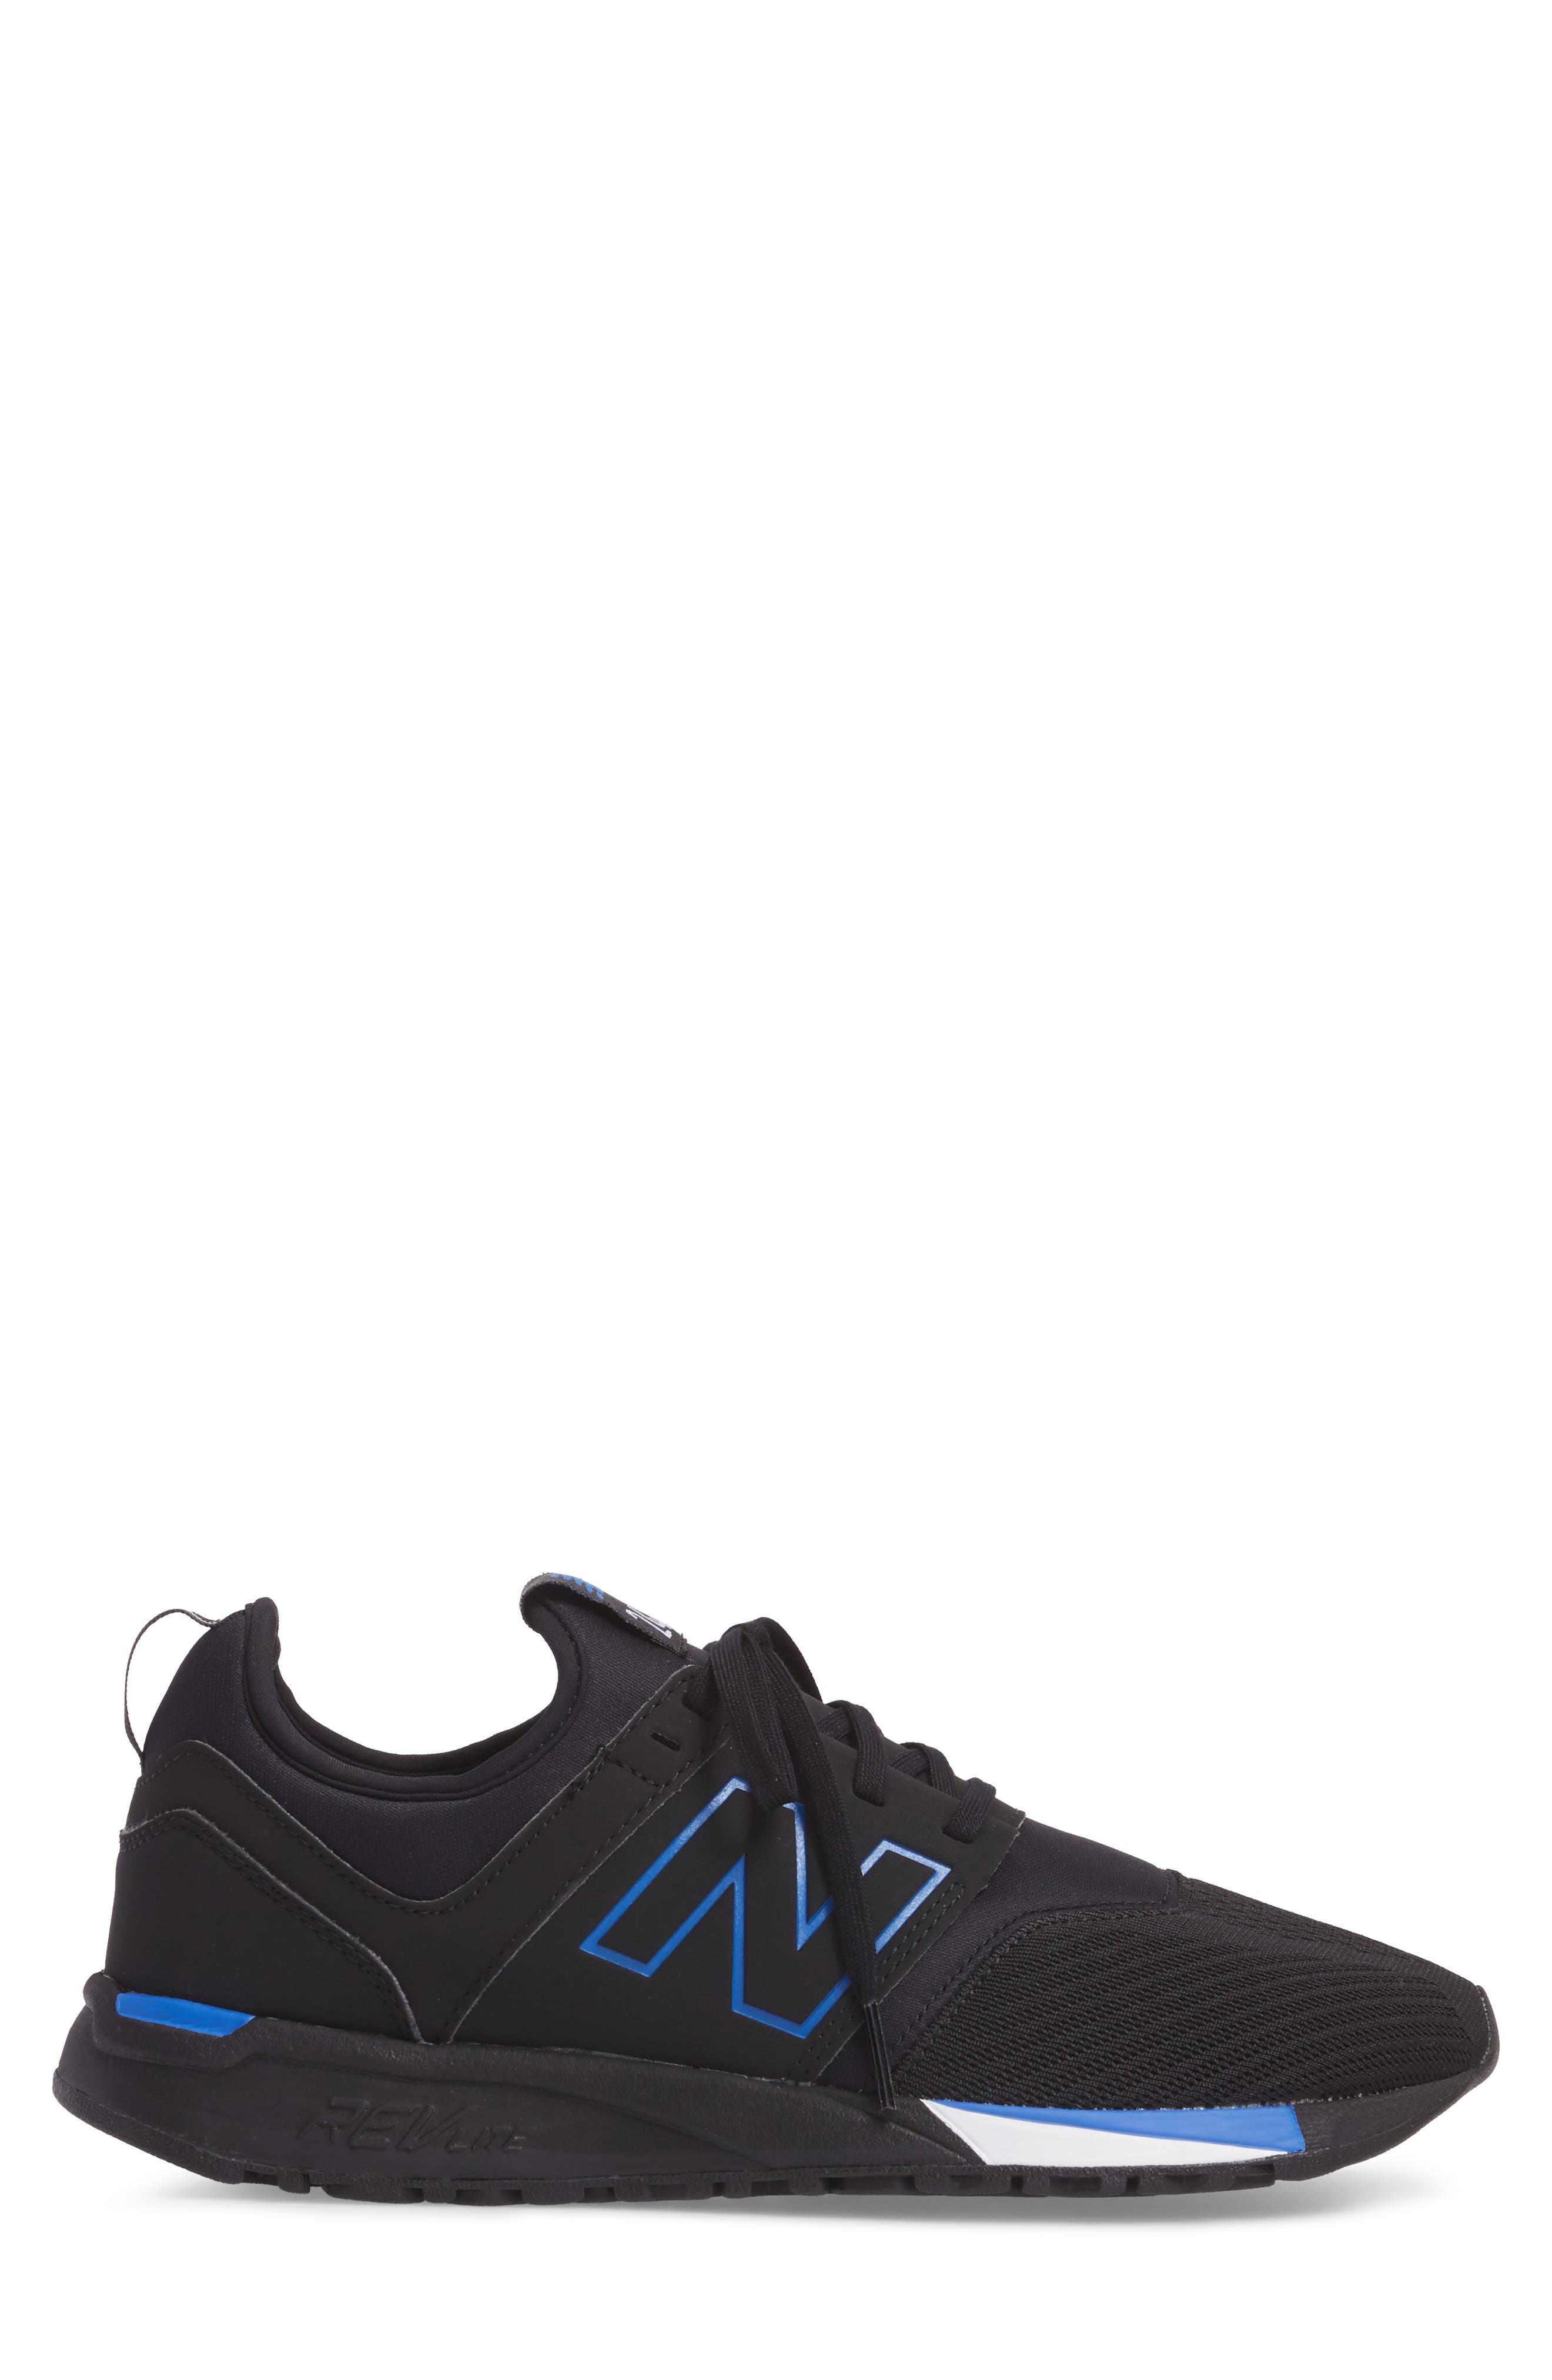 247 Sneaker,                             Alternate thumbnail 3, color,                             Black